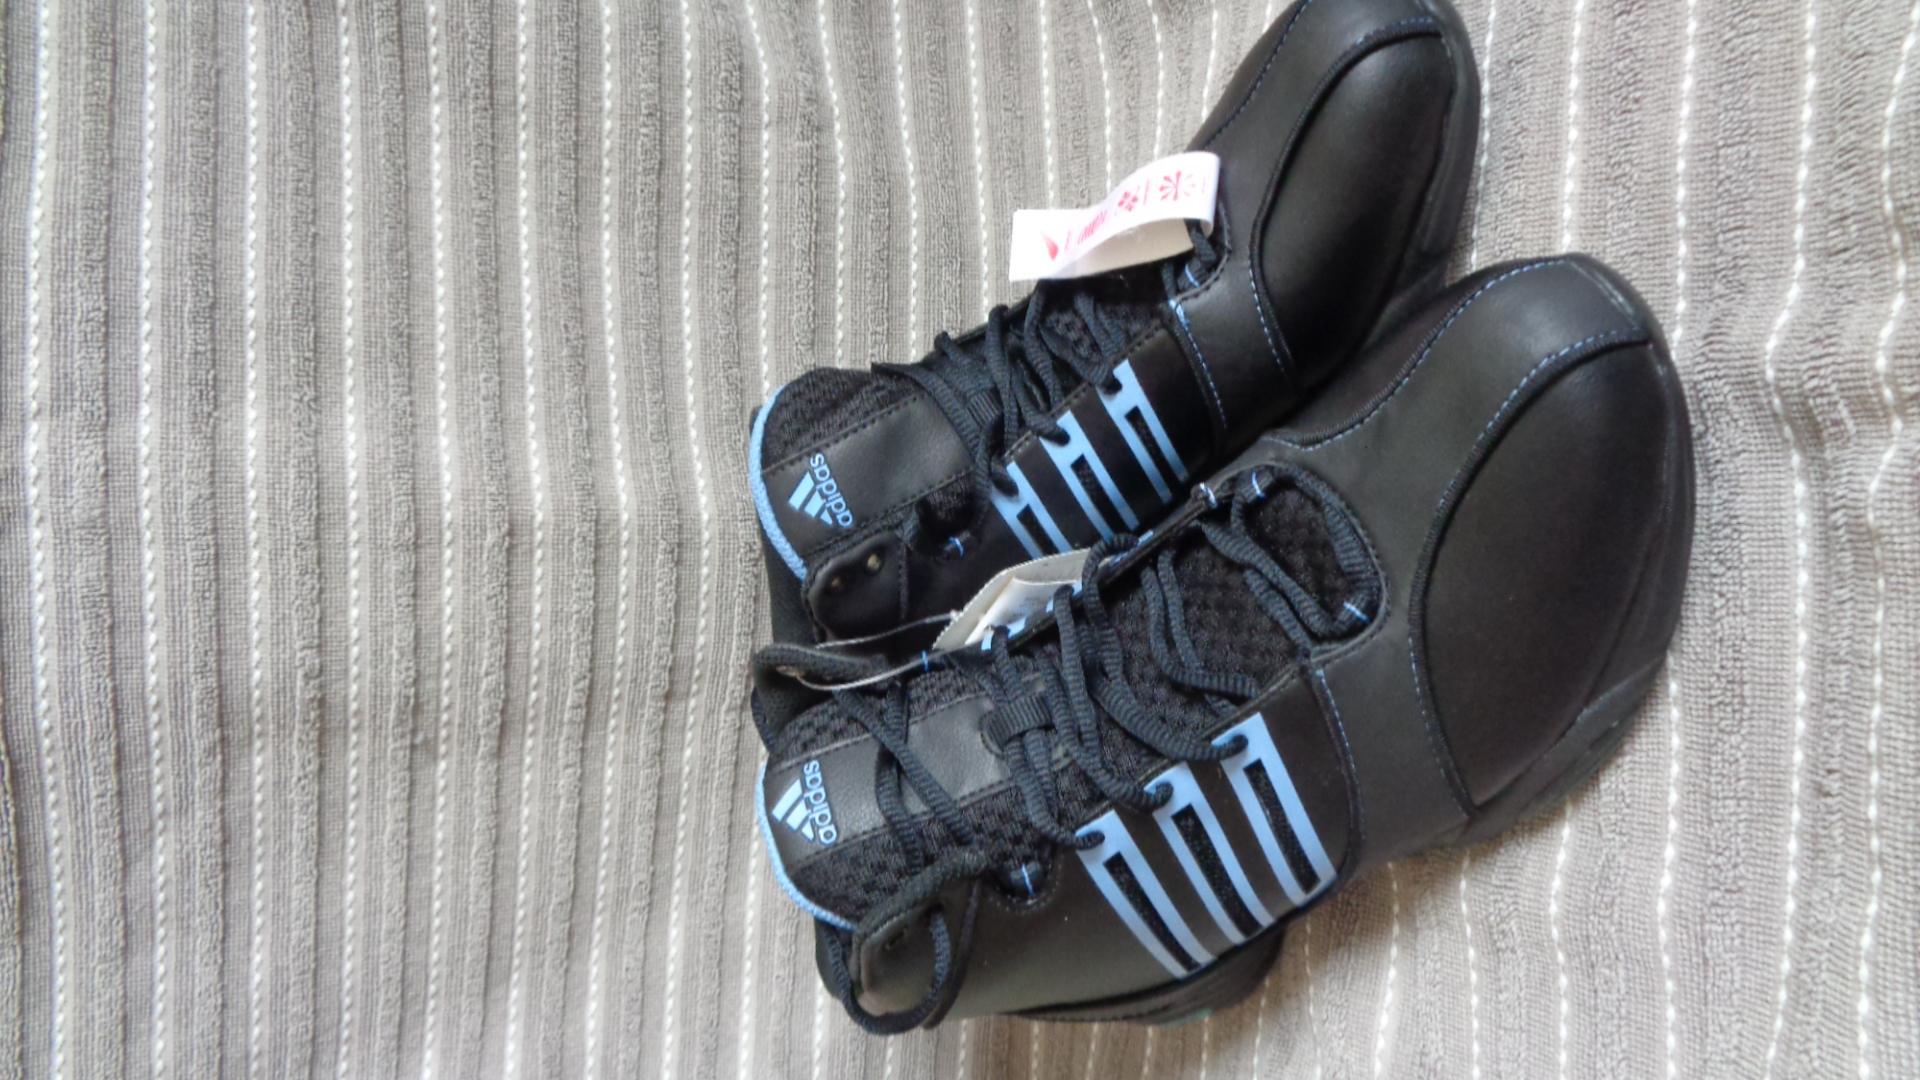 Sportschuh - Adidas